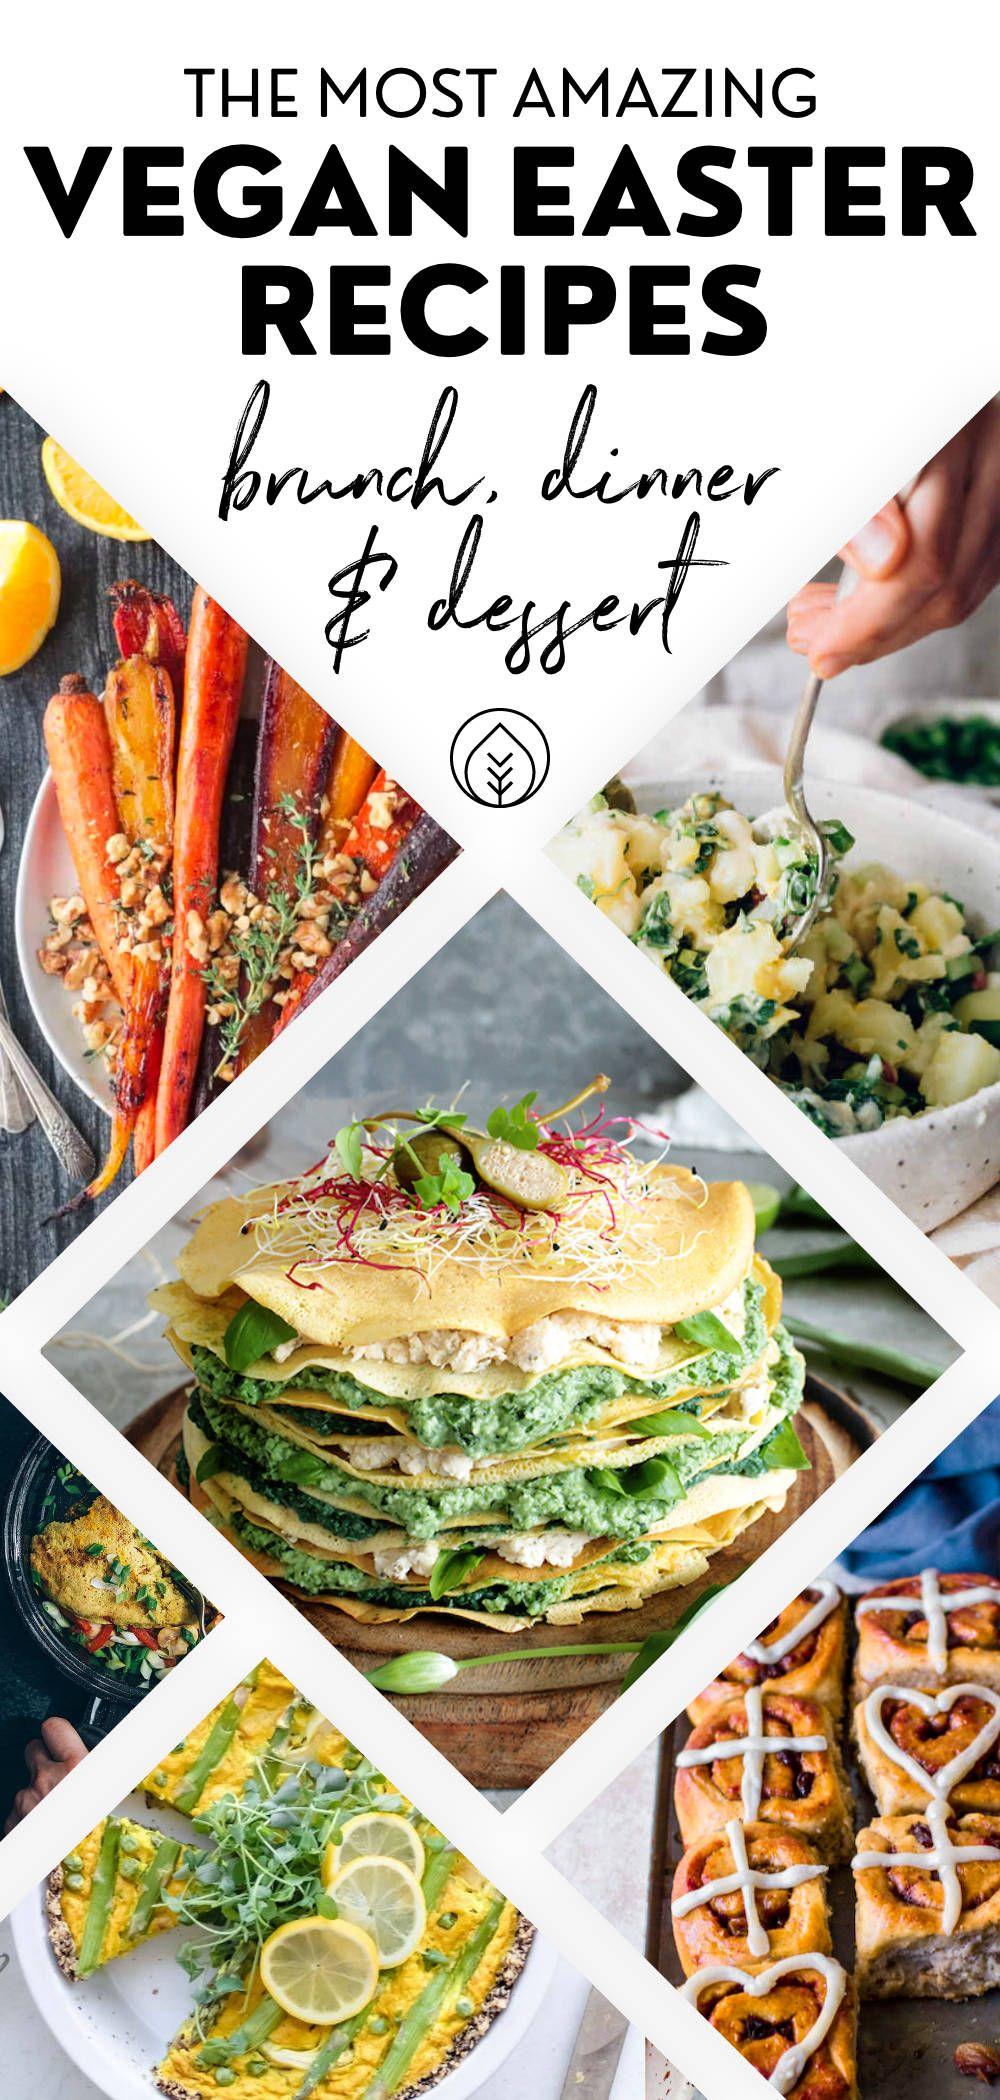 46 healthy vegan easter recipes breakfast to dinner in